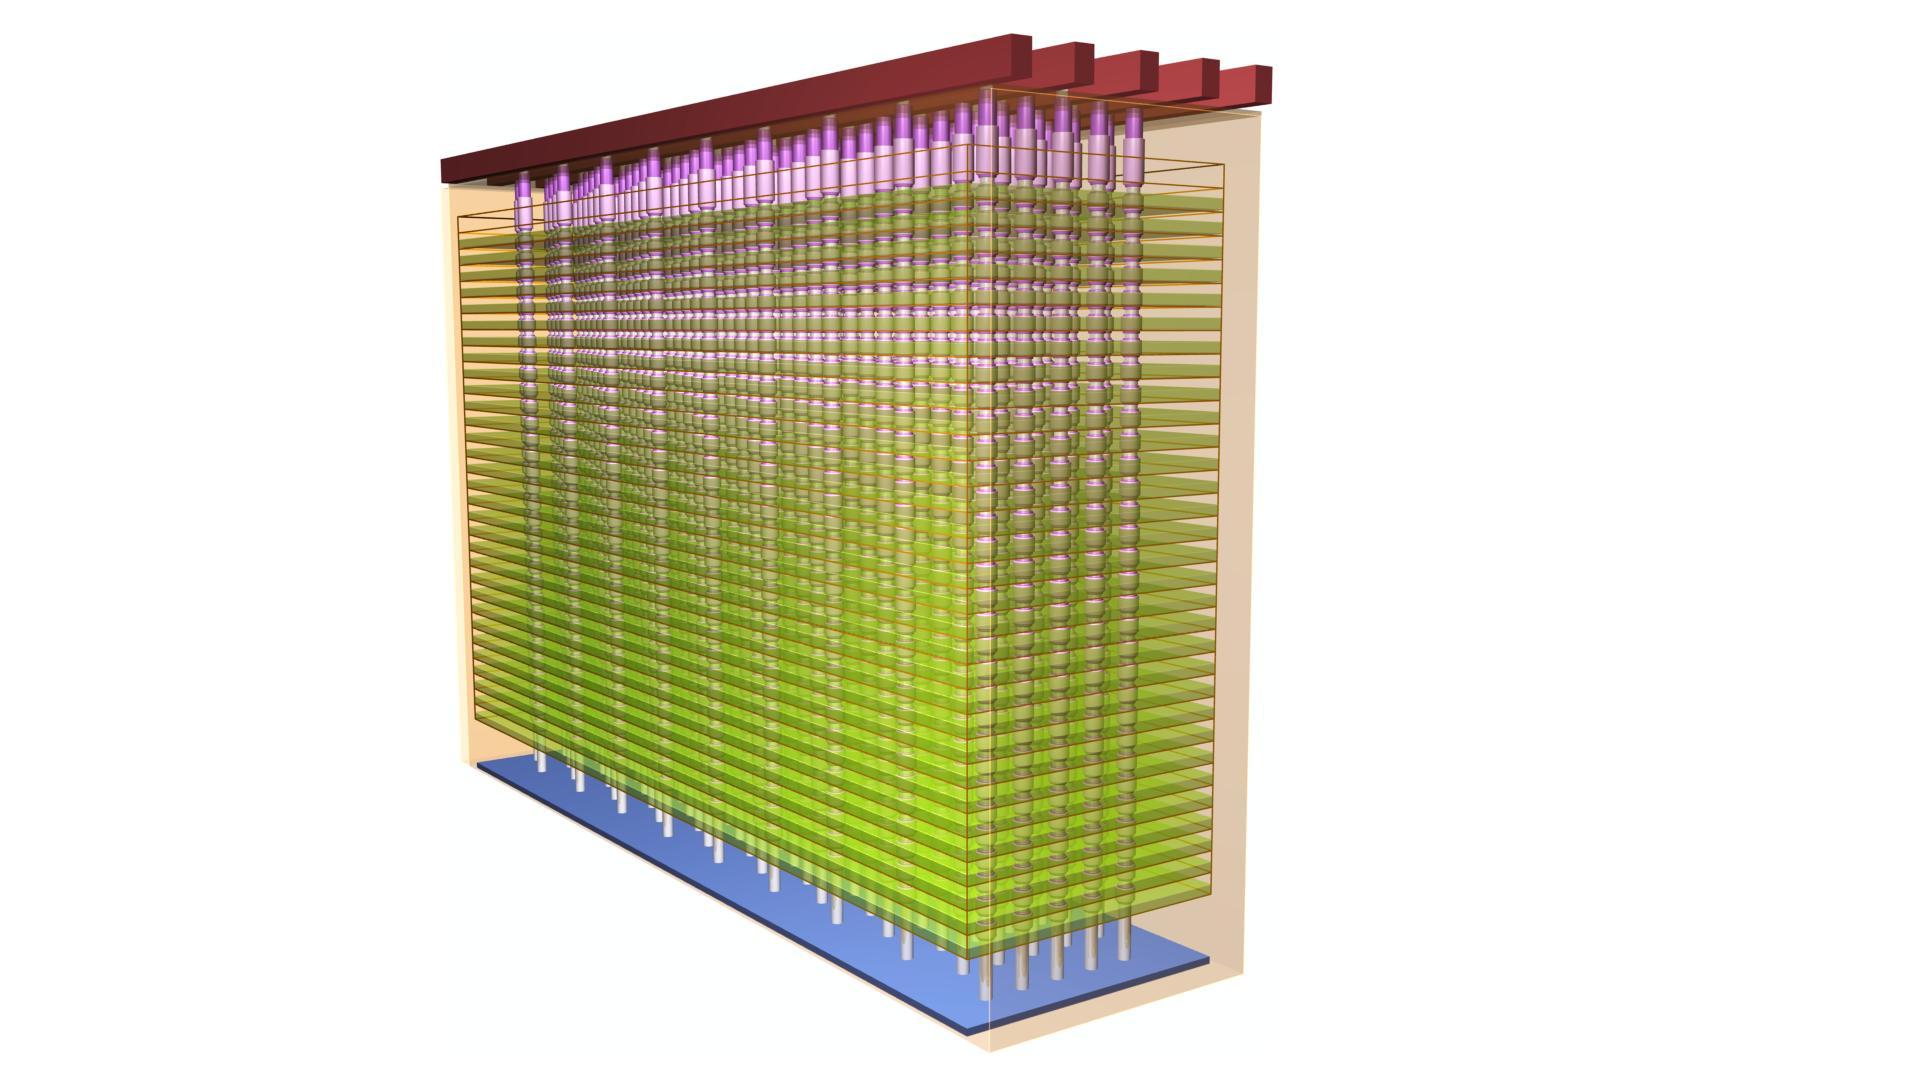 Благодаря флэш-памяти 3D NAND могут появиться 10 ТБSSD-накопители